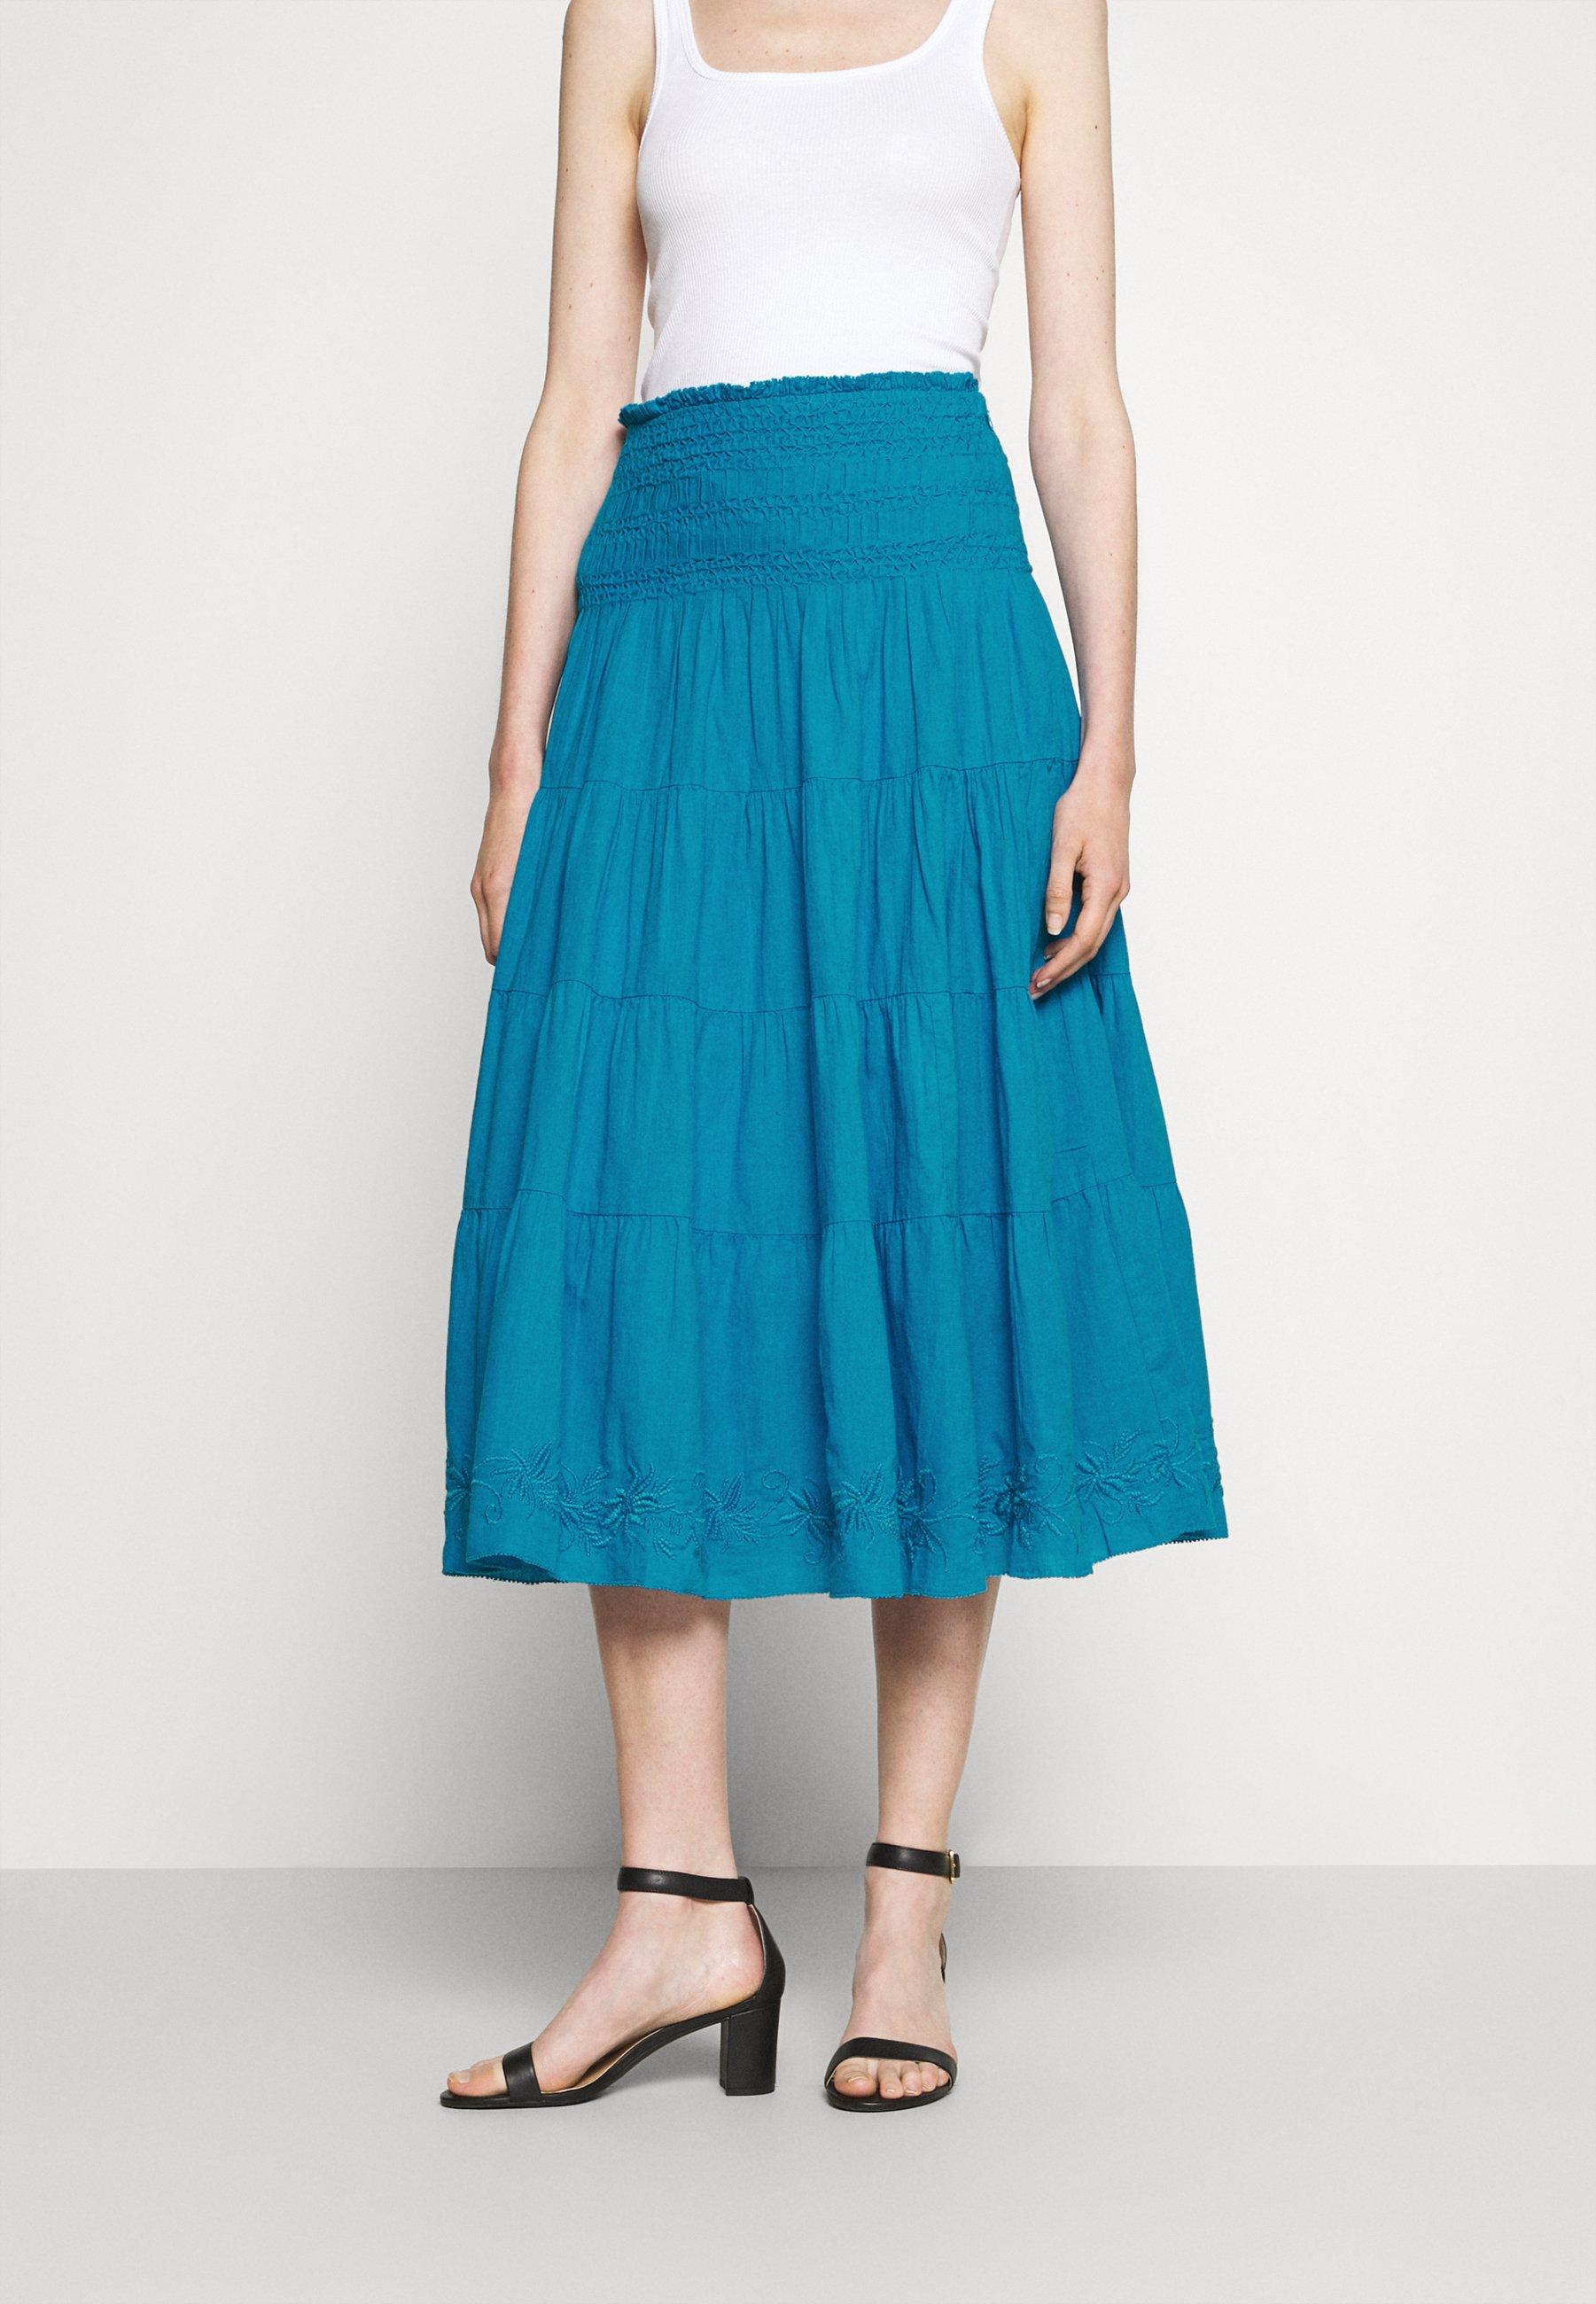 Femme LUHANNA PEASANT SKIRT - Jupe plissée